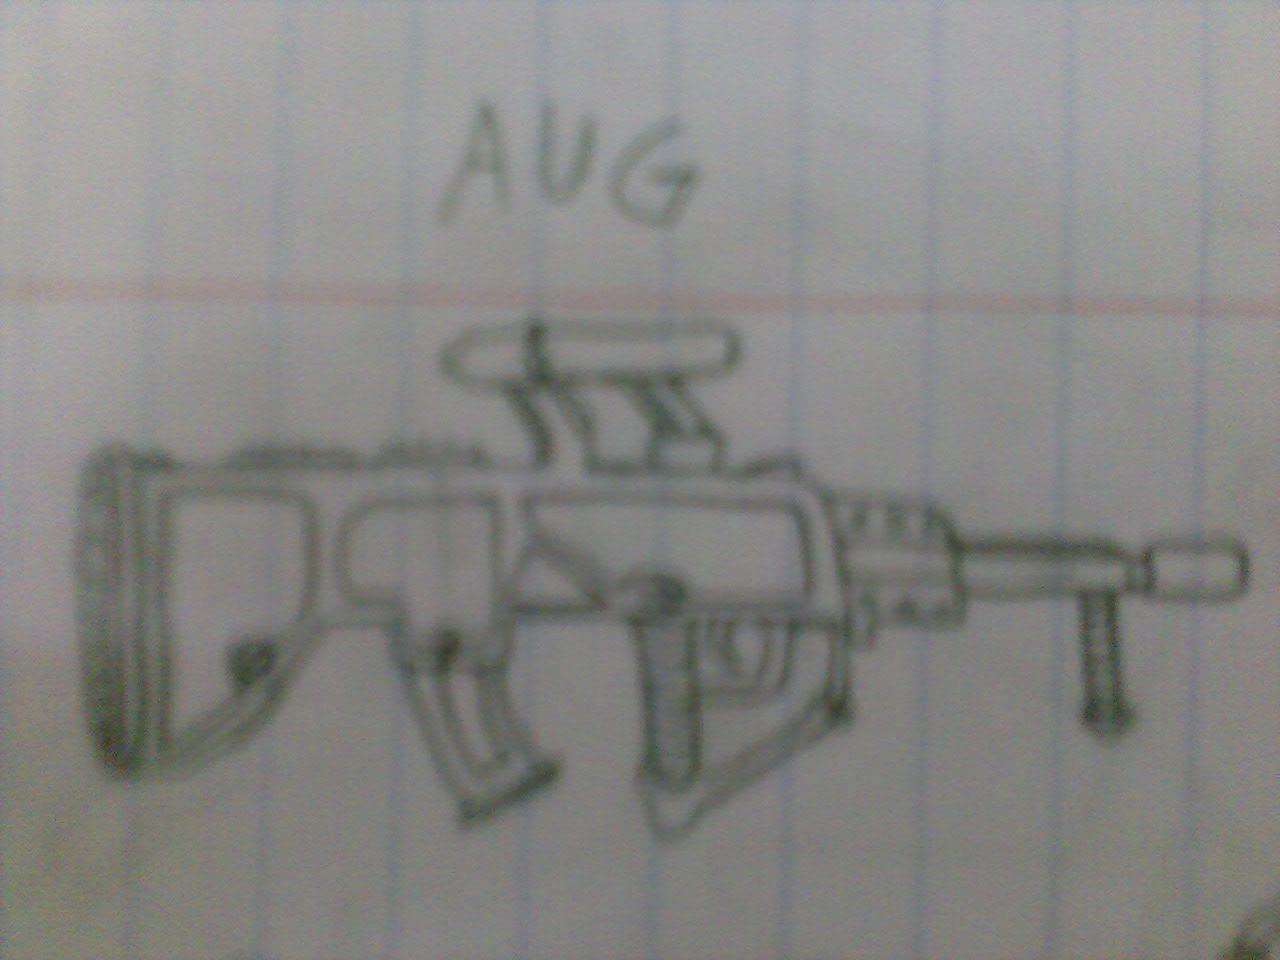 Steyr AUG Drawing